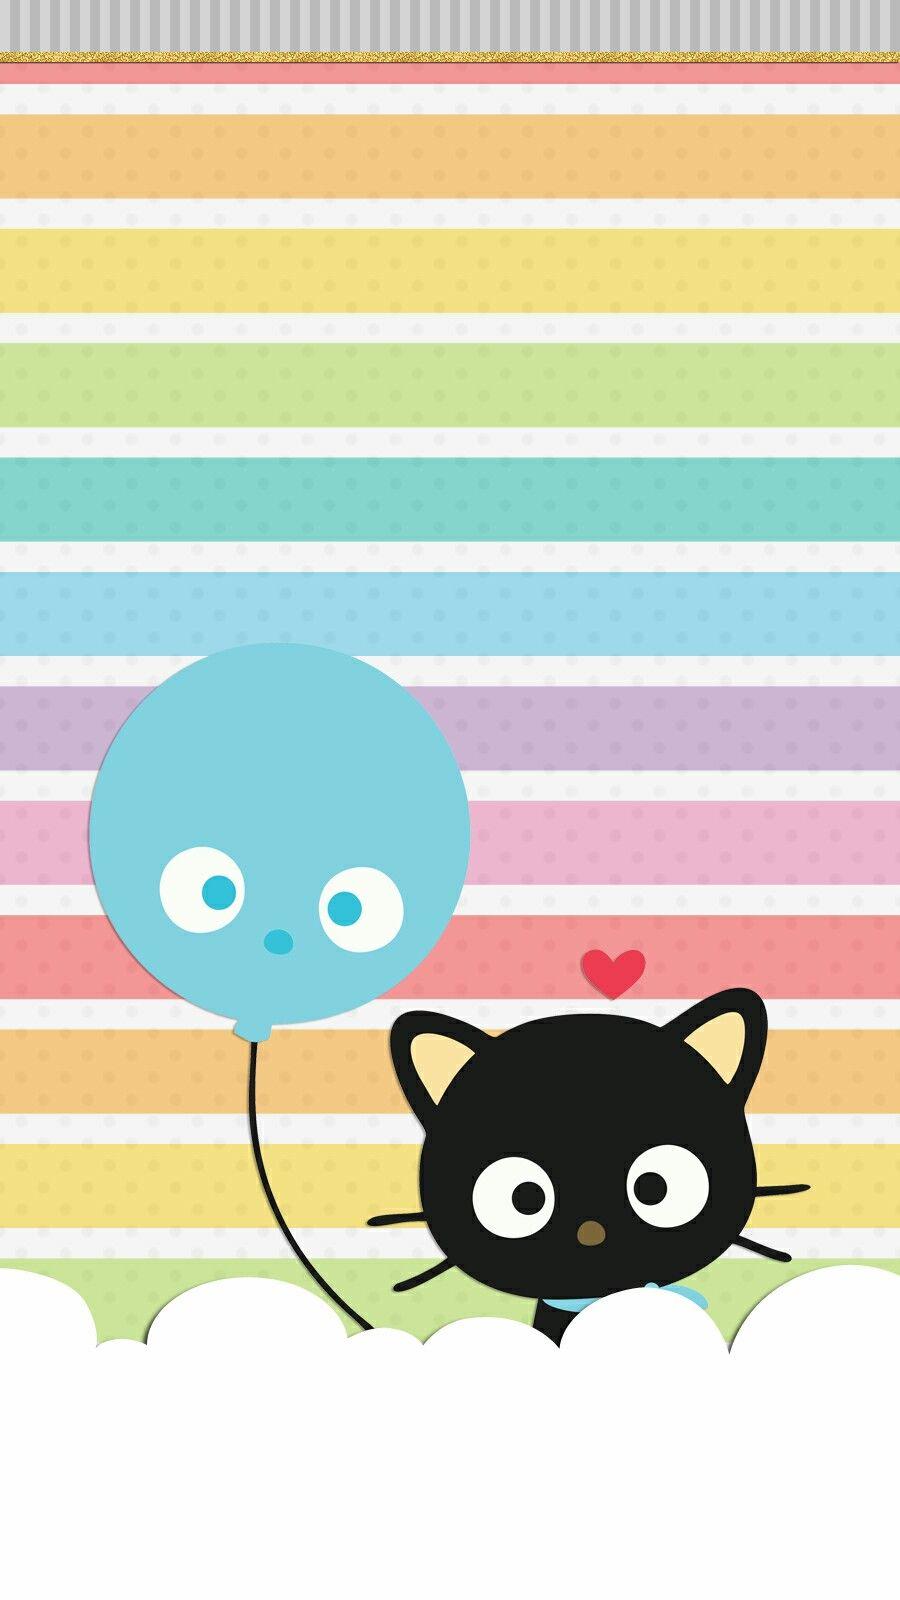 Wallpaper iphone keroppi -  Chococat Wallpaper Iphone